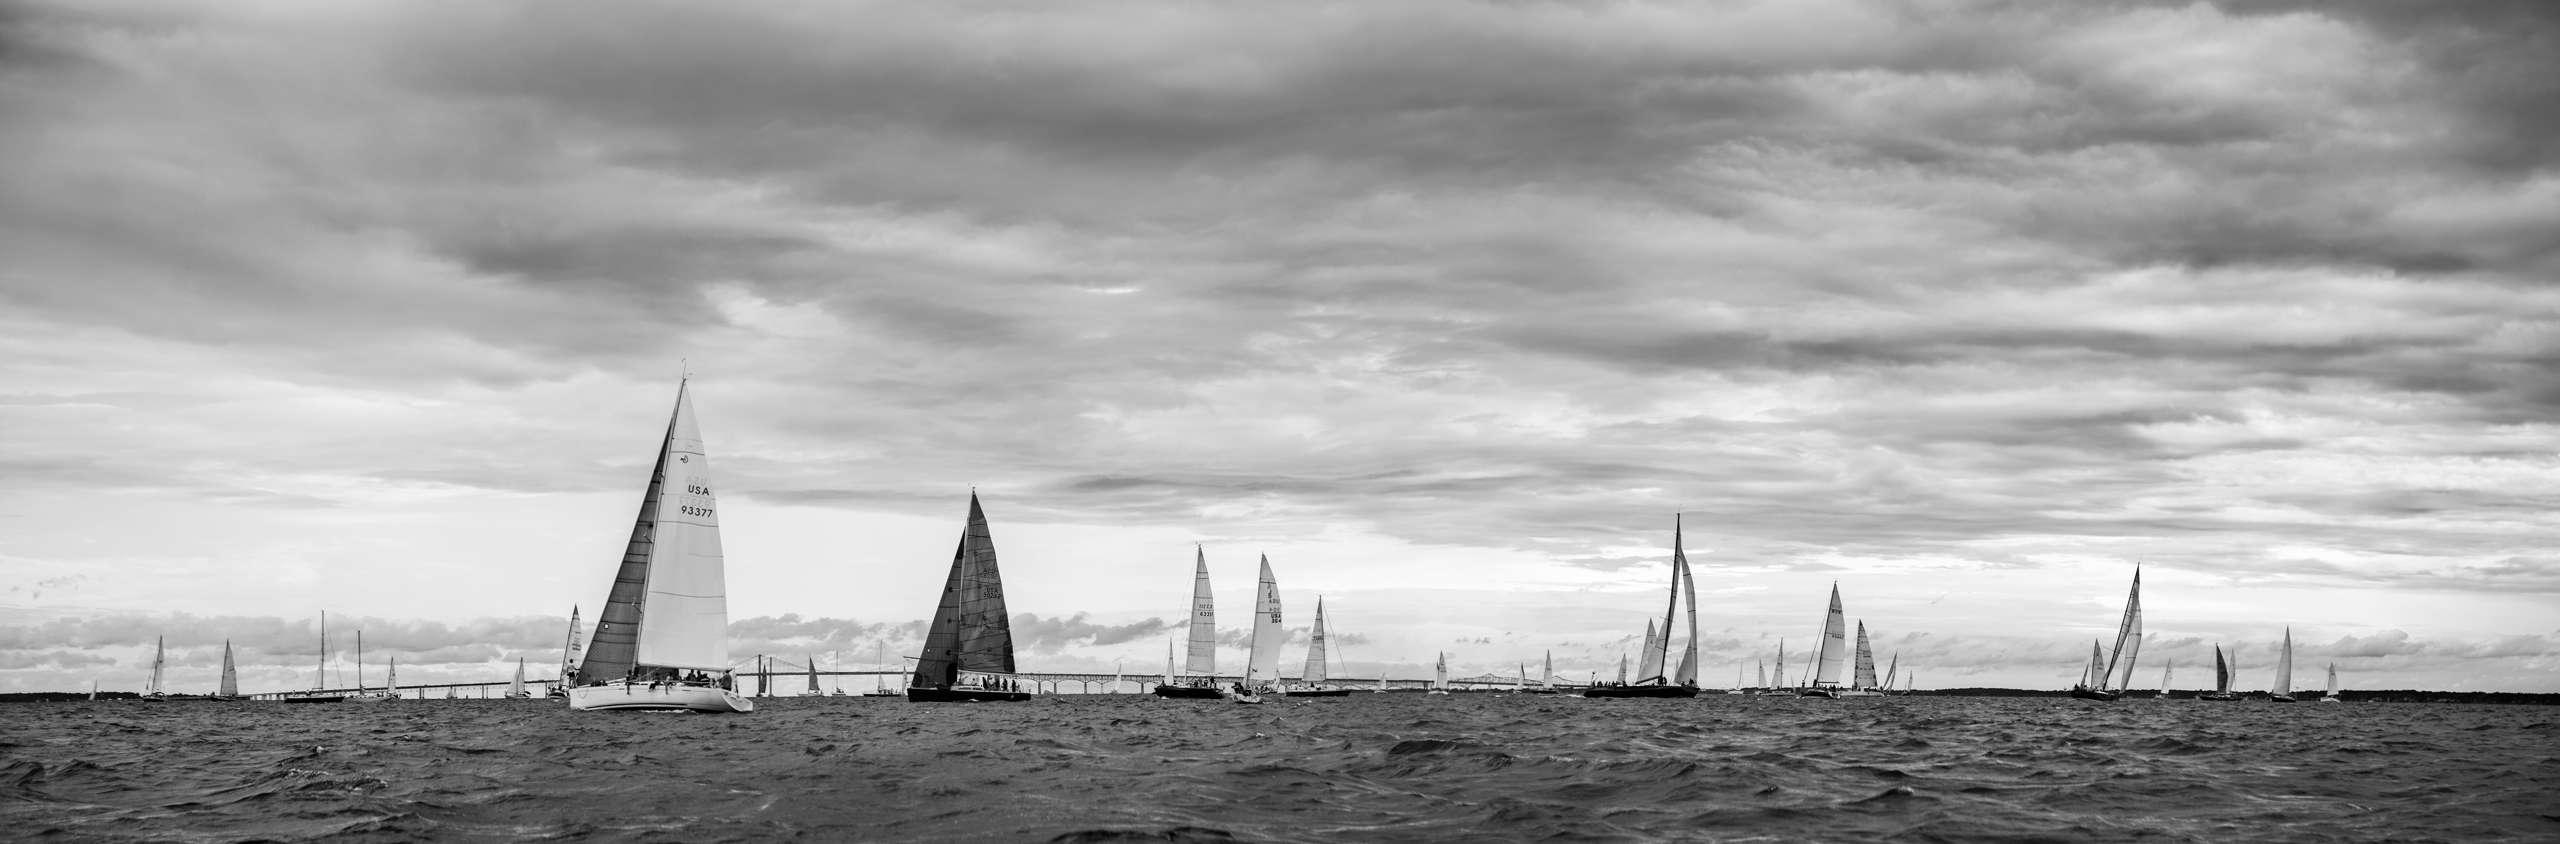 PORTFOLIO - Maritime #6 - B&W